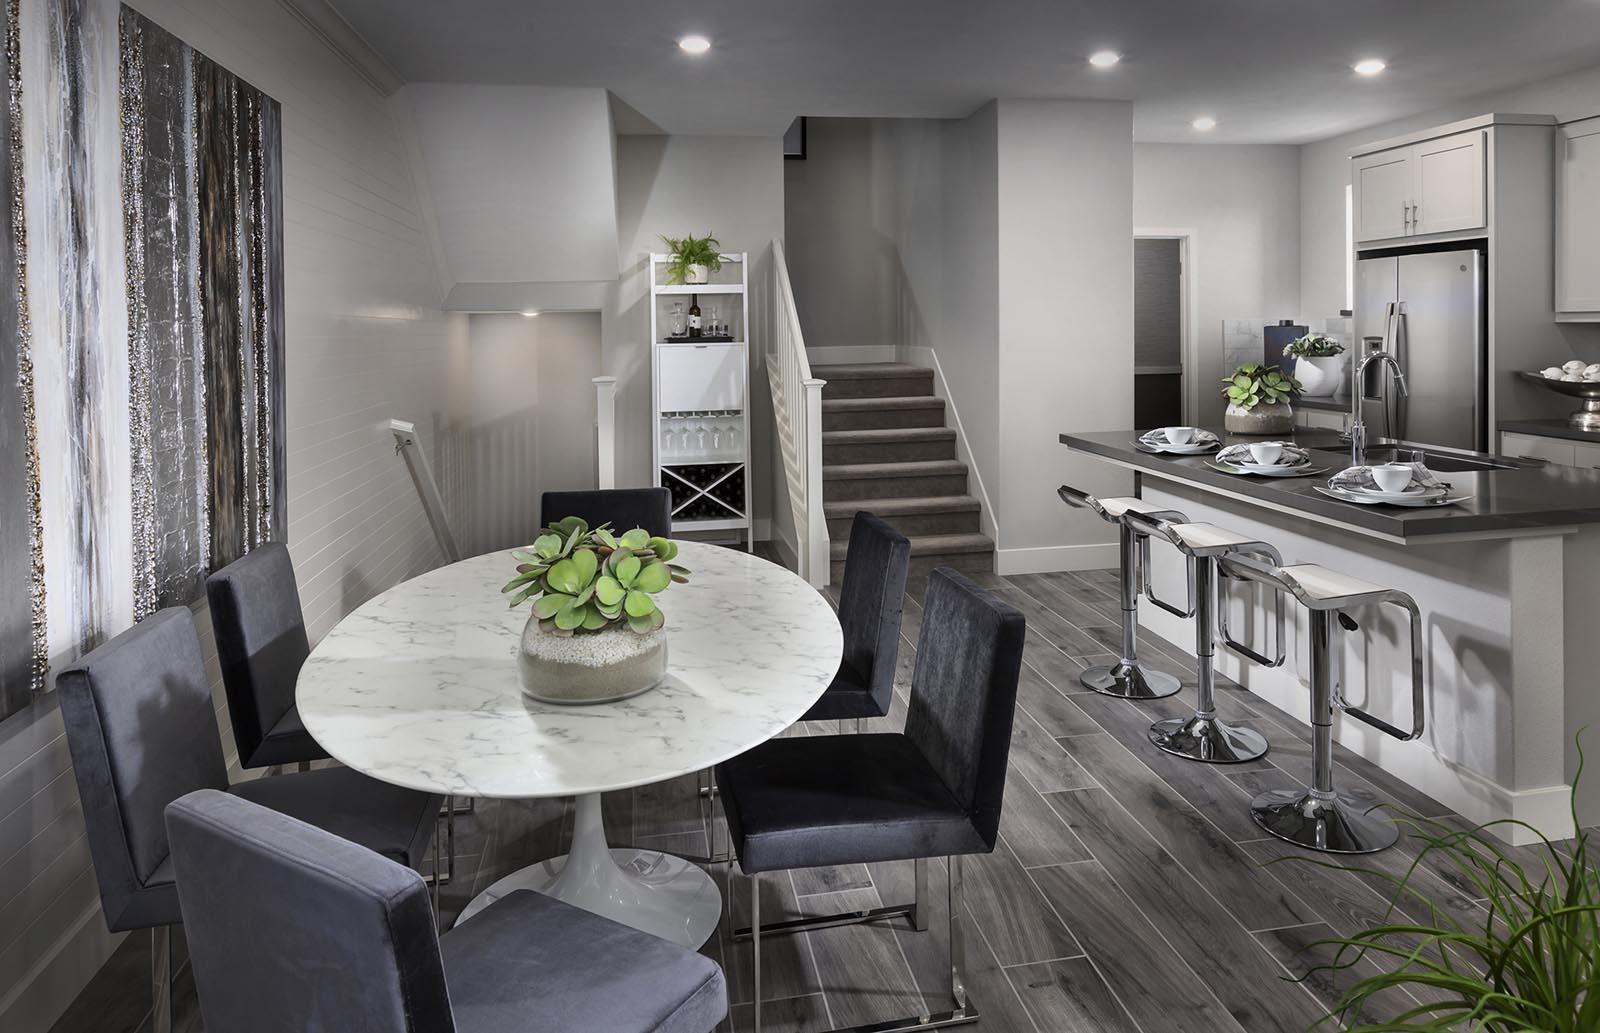 Dining Residence 2 | Downing at Boulevard by Lennar, Dublin, CA